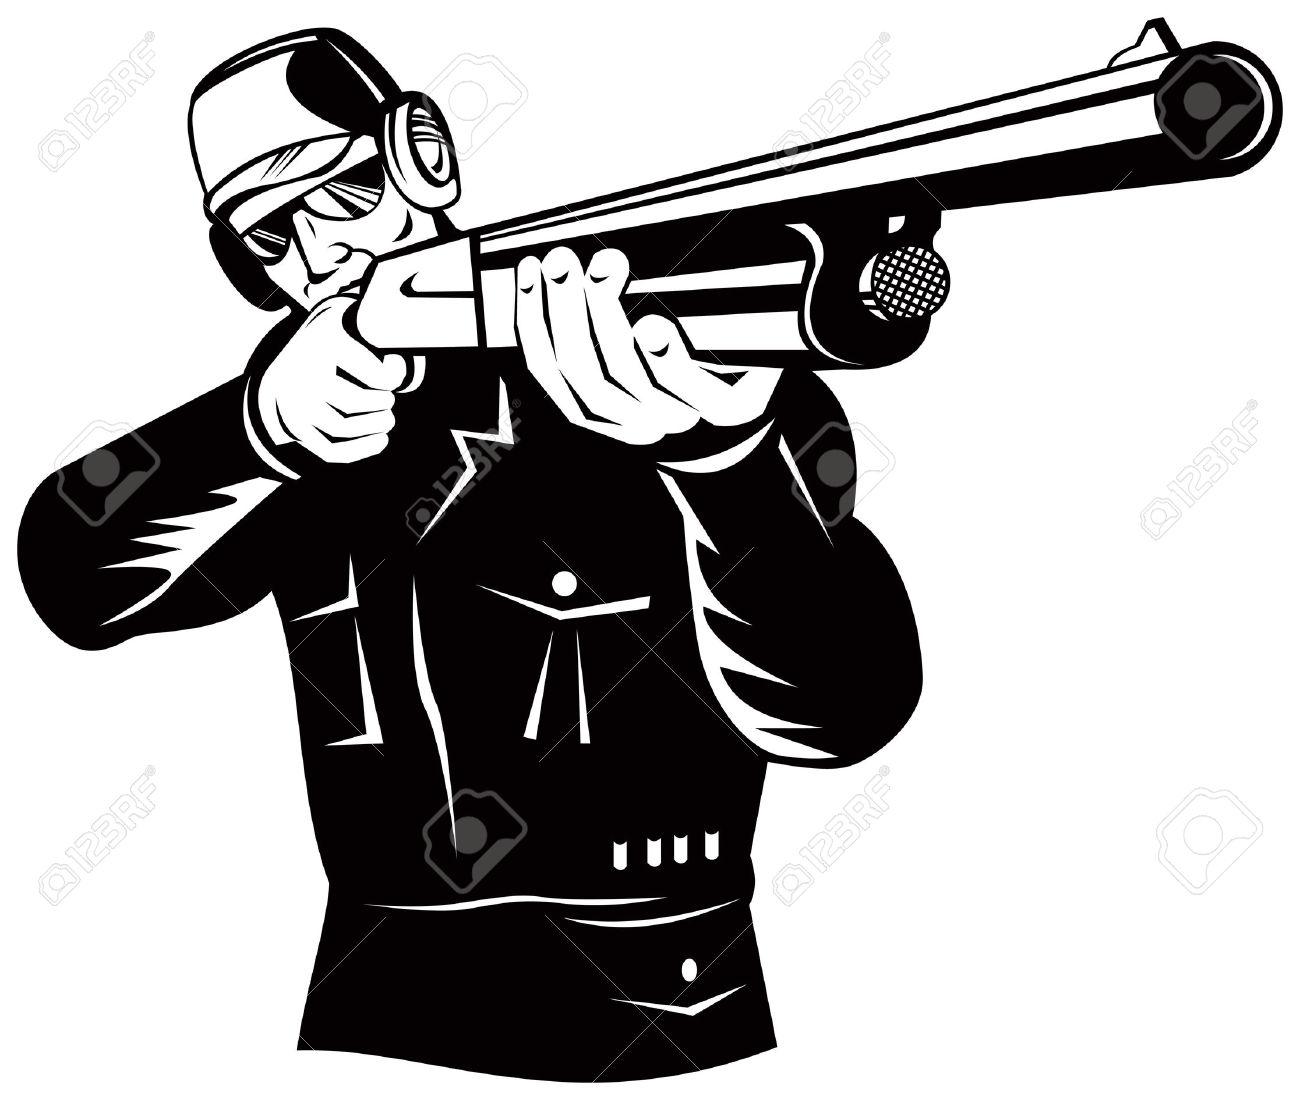 Clipart gun shooting.